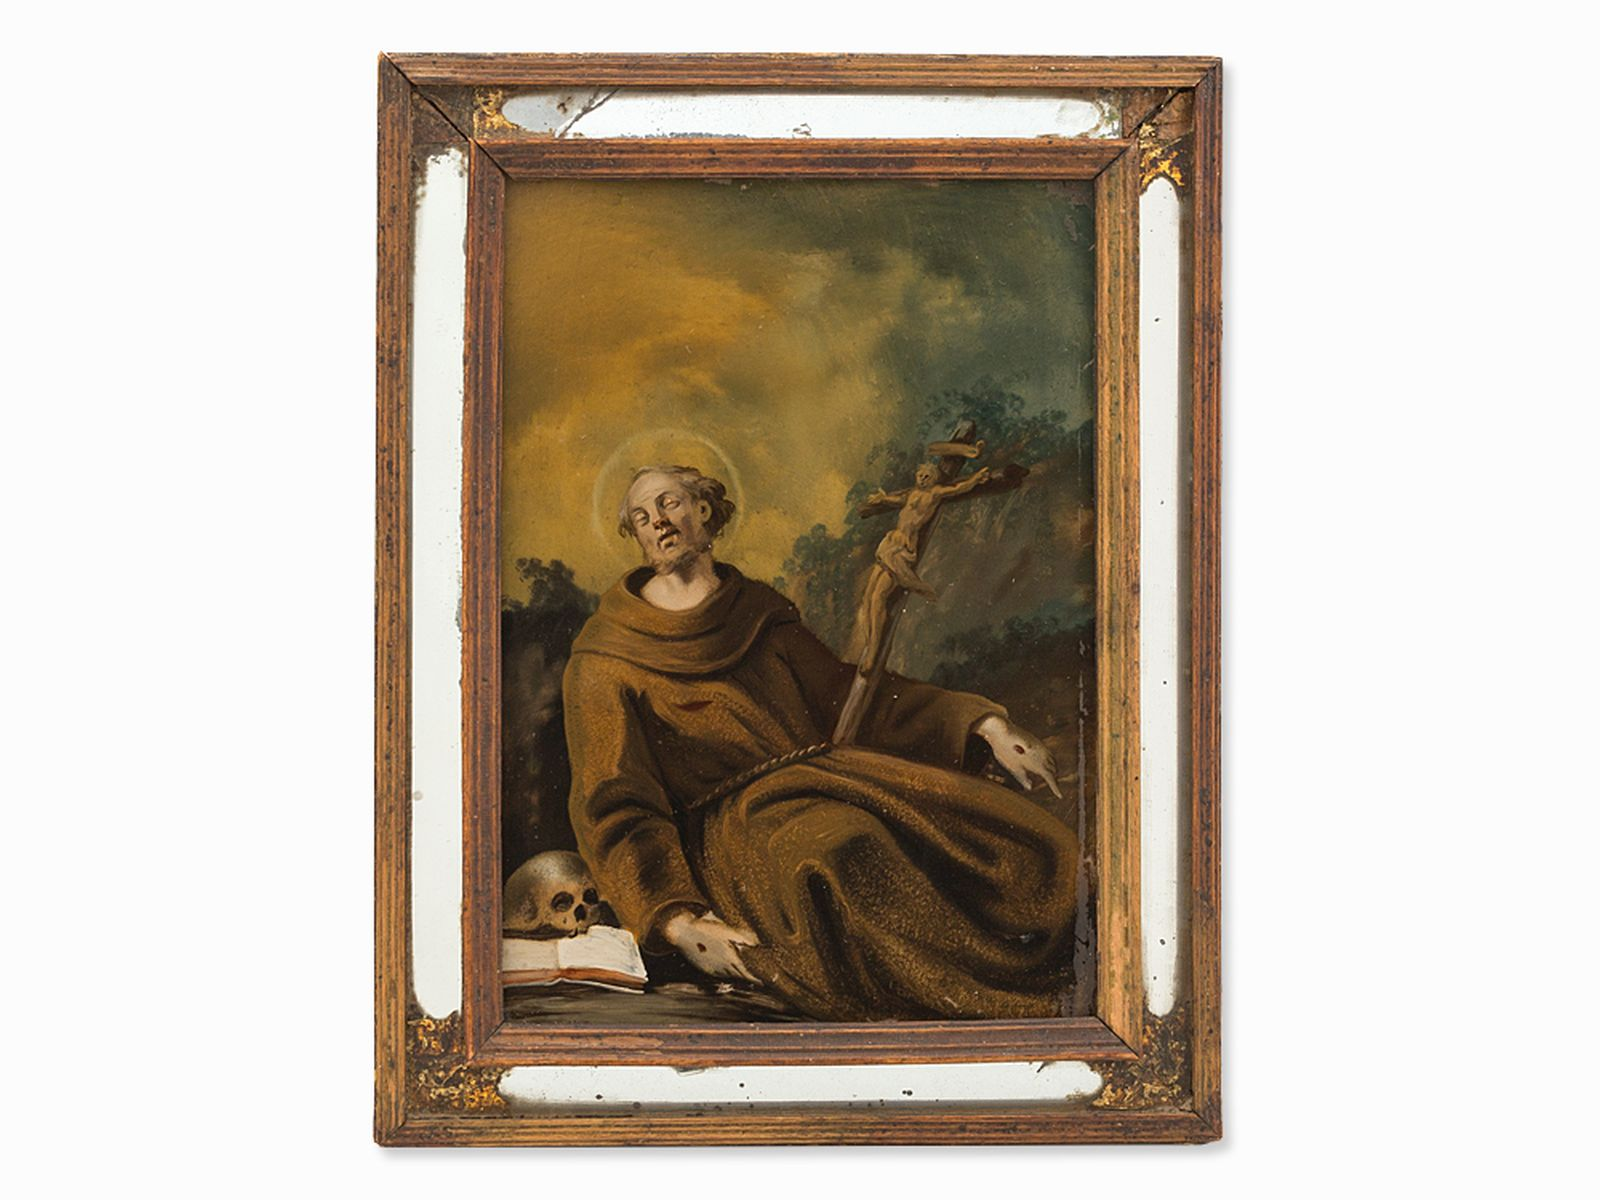 #11 St. Francis, Reverse Glass Painting, Spanish School, 18th C. |Spanische Schule, Hl. Franziskus, 18. Jahrhundert Image